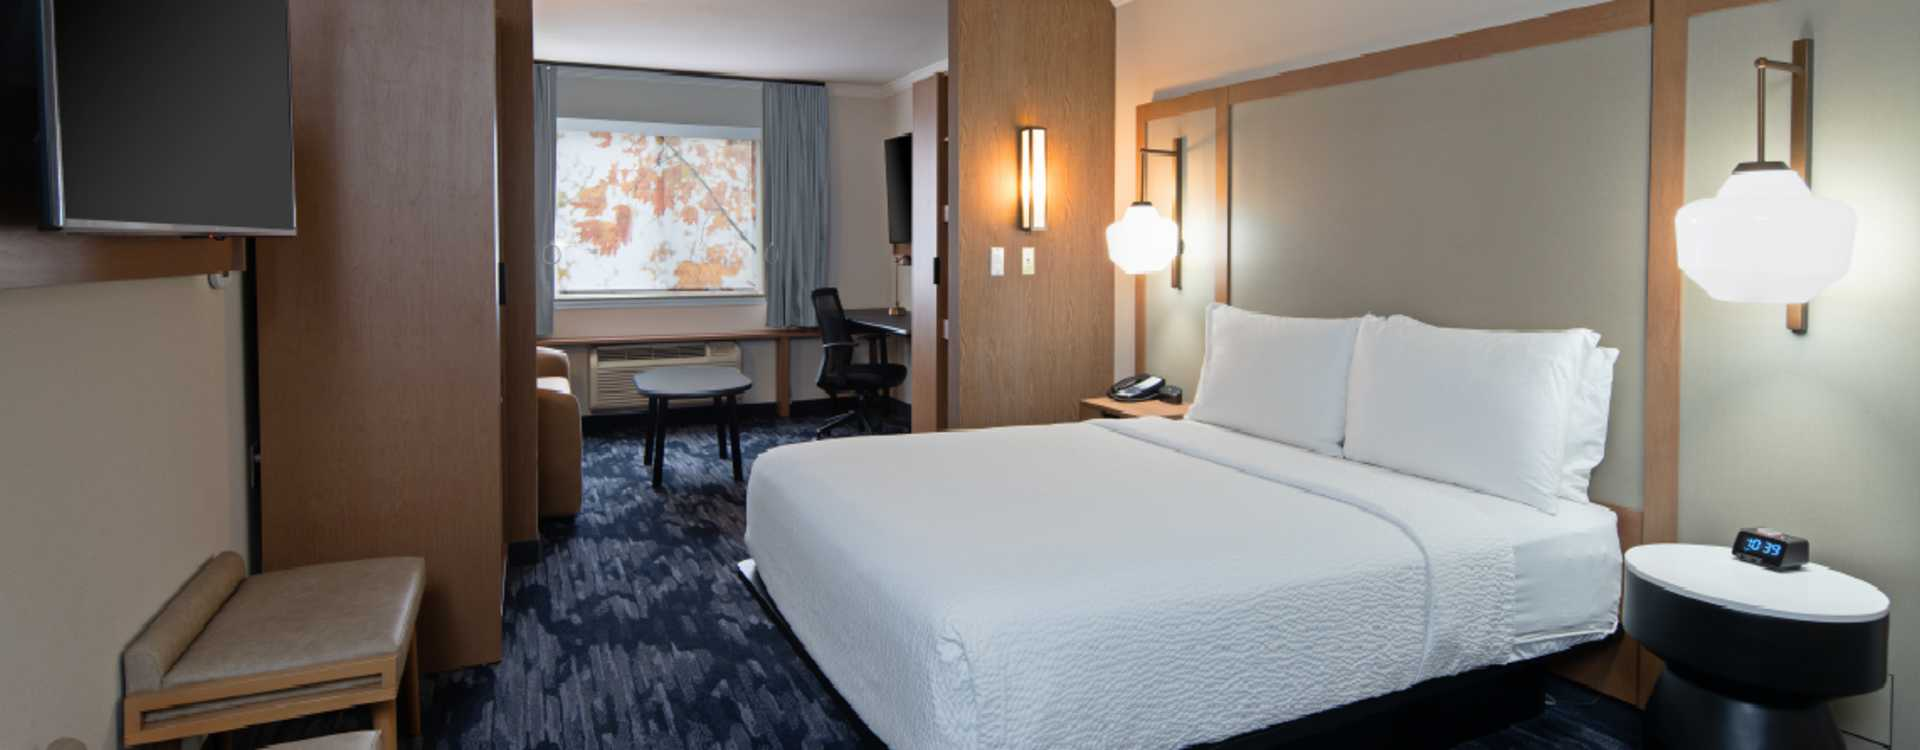 Fairfield Inn by Marriott Seattle Sea-Tac Airport Queen Suite